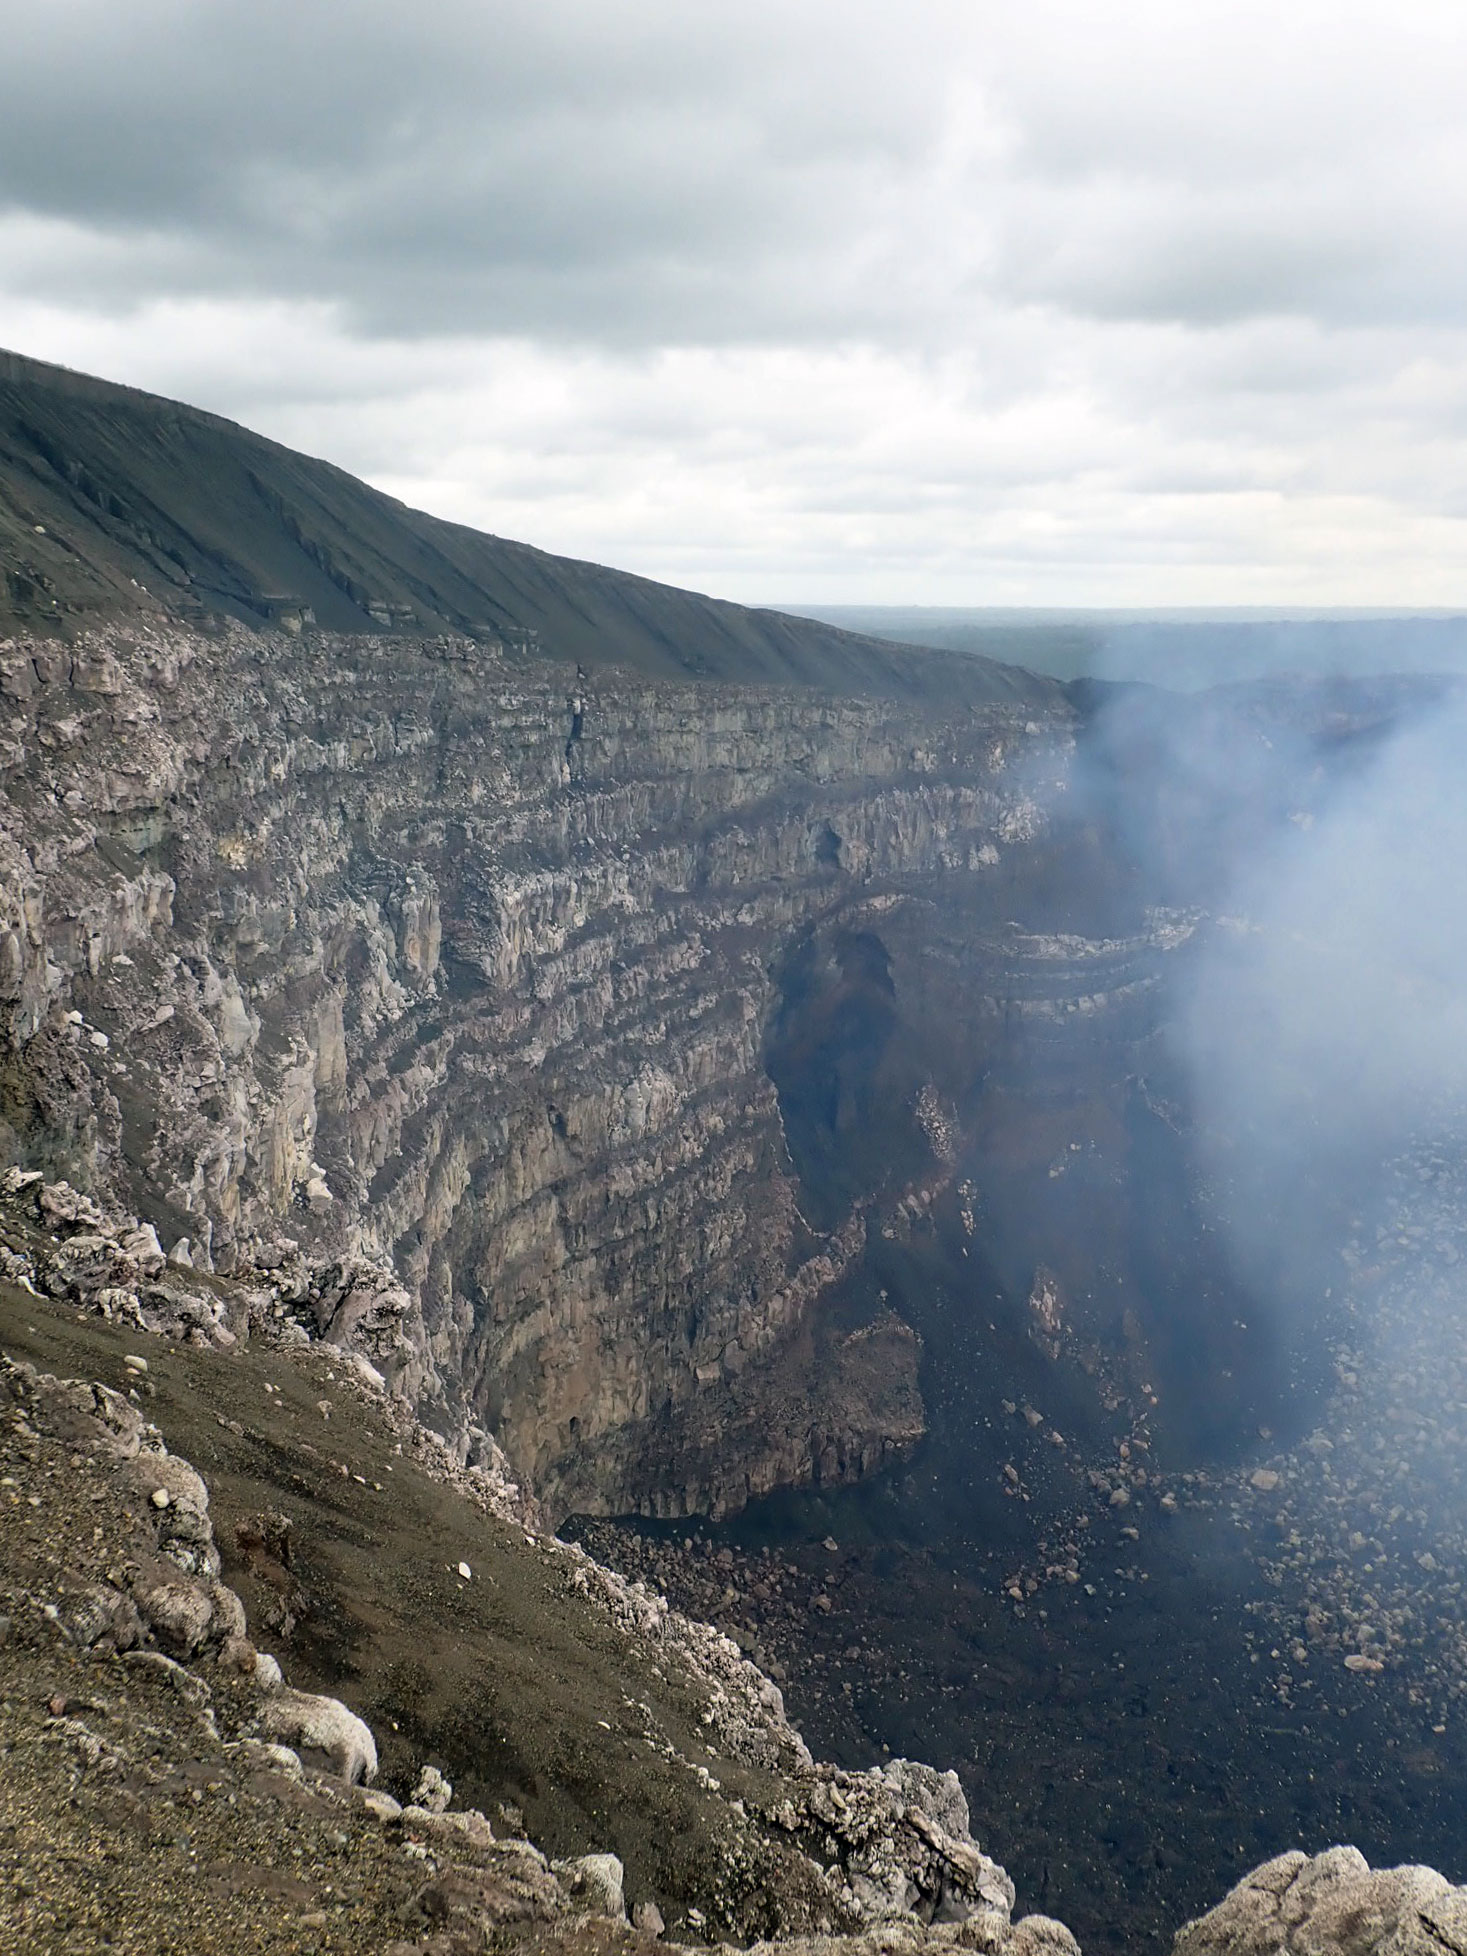 Masaya Volcano | active volcano | Nicaragua travel | Nicaragua | Central America travel | Nicaragua travel guide | Nicaragua bucket list | anajacqueline.com | www.anajacqueline.com